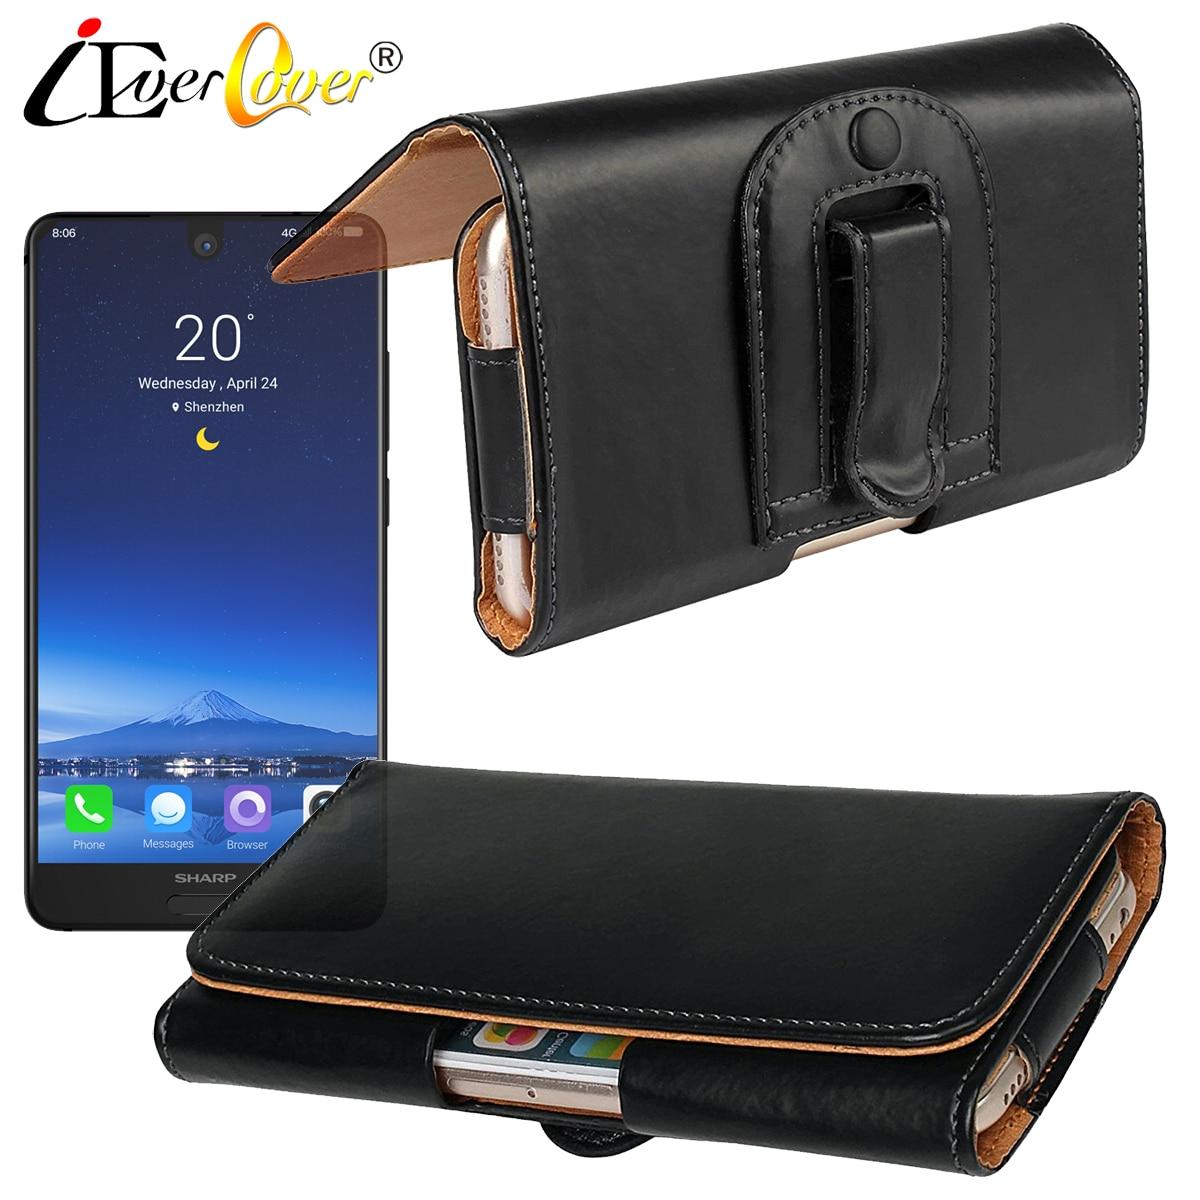 Custodia Huawei P8 Lite Custodia In Pelle Custodia Fondina Iphone